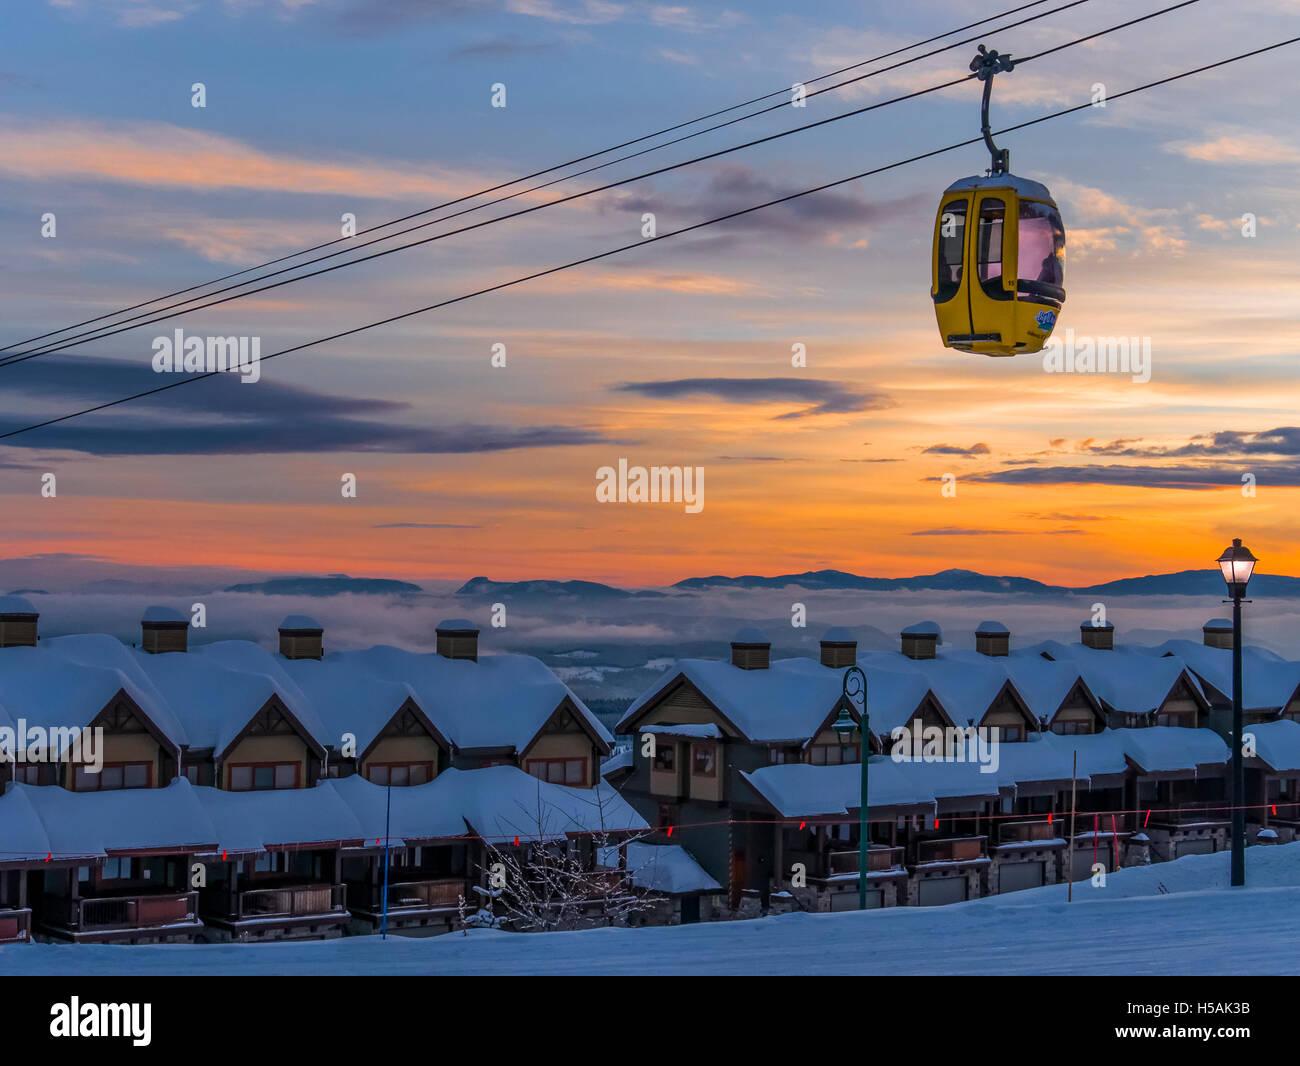 Sonnenuntergang und Gondel, Big White Ski Resort, Britisch-Kolumbien, Kanada. Stockbild